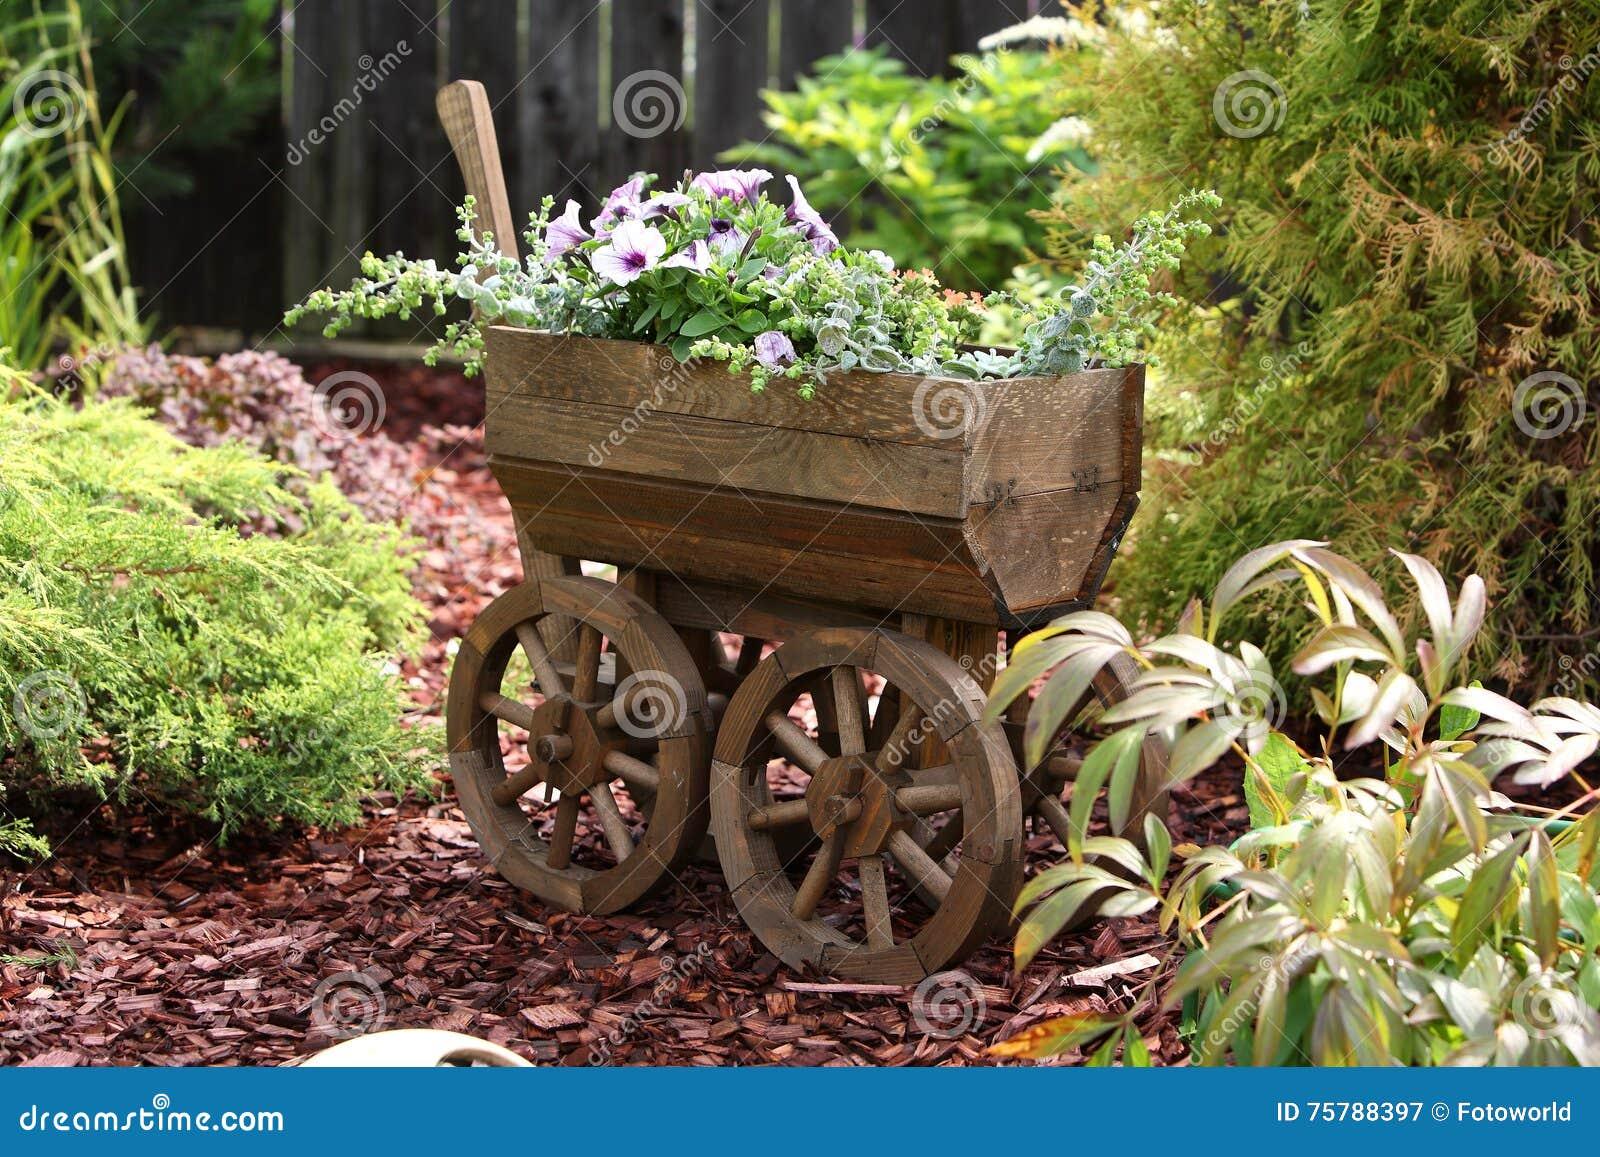 Garden - Old flower cart stock image. Image of flowerpot - 75788397